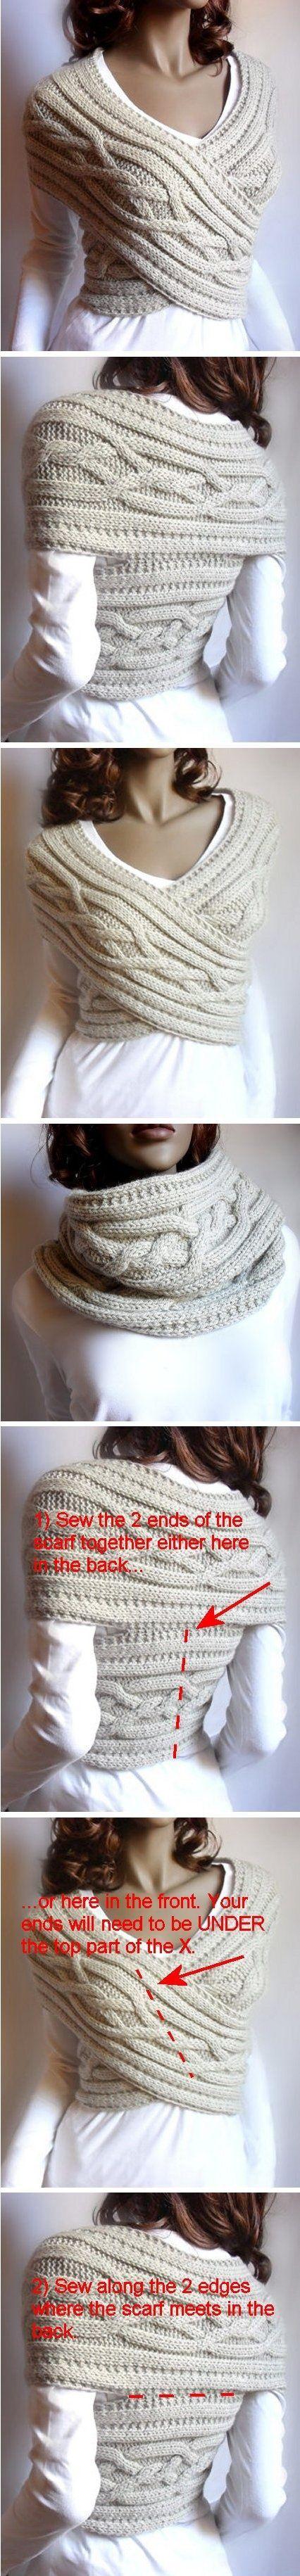 @Lisa Phillips-Barton Phillips-Barton Rael @Trish Papadakos Papadakos Lovato Sew a scarf into a vest.